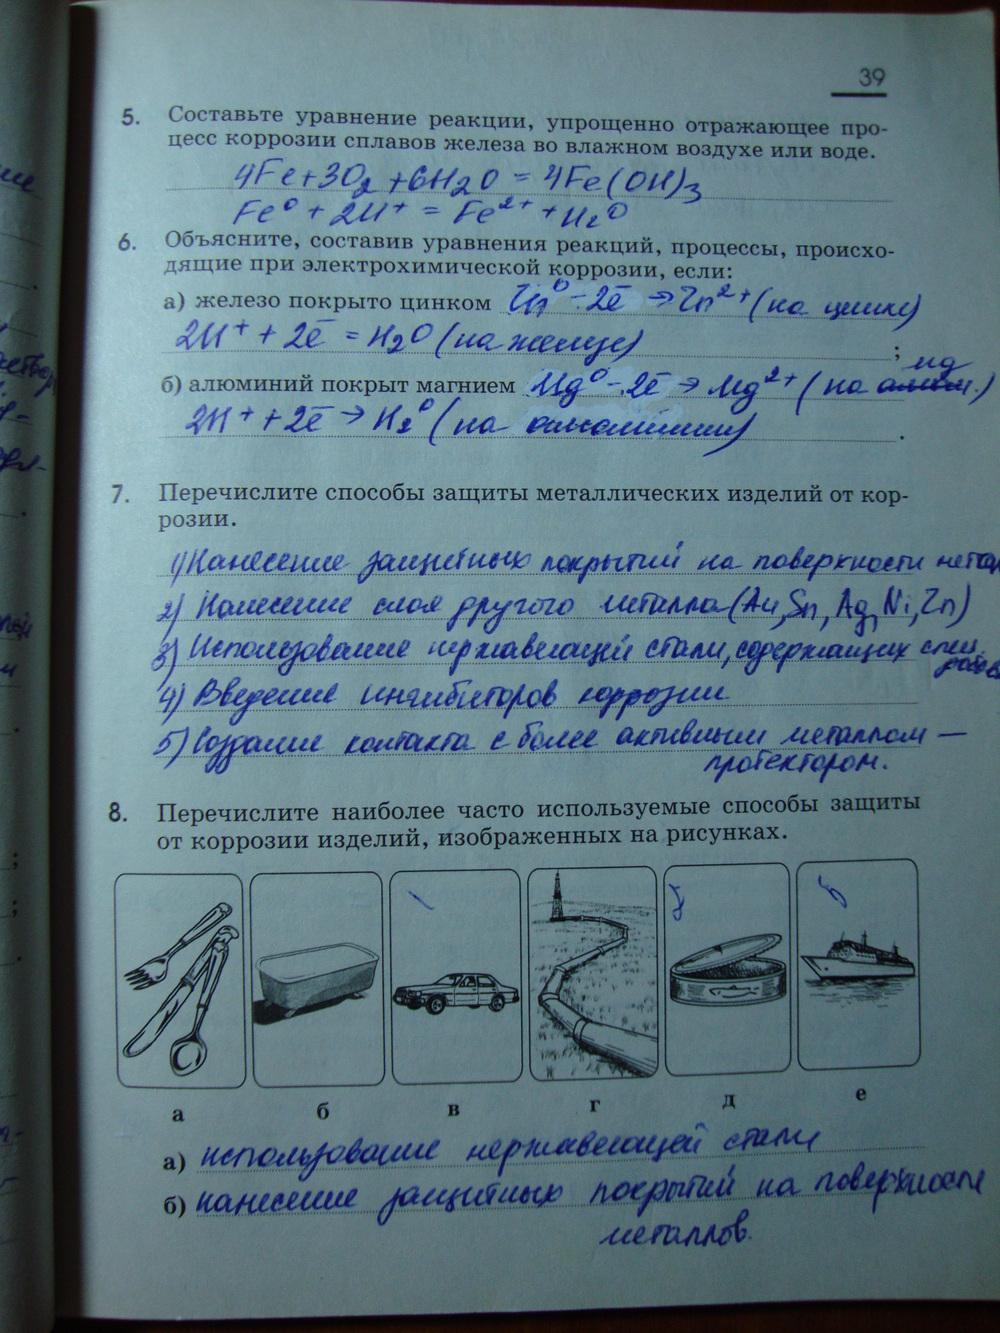 Гдз по химия 9 класс габриелян рабочая тетрадь 2018